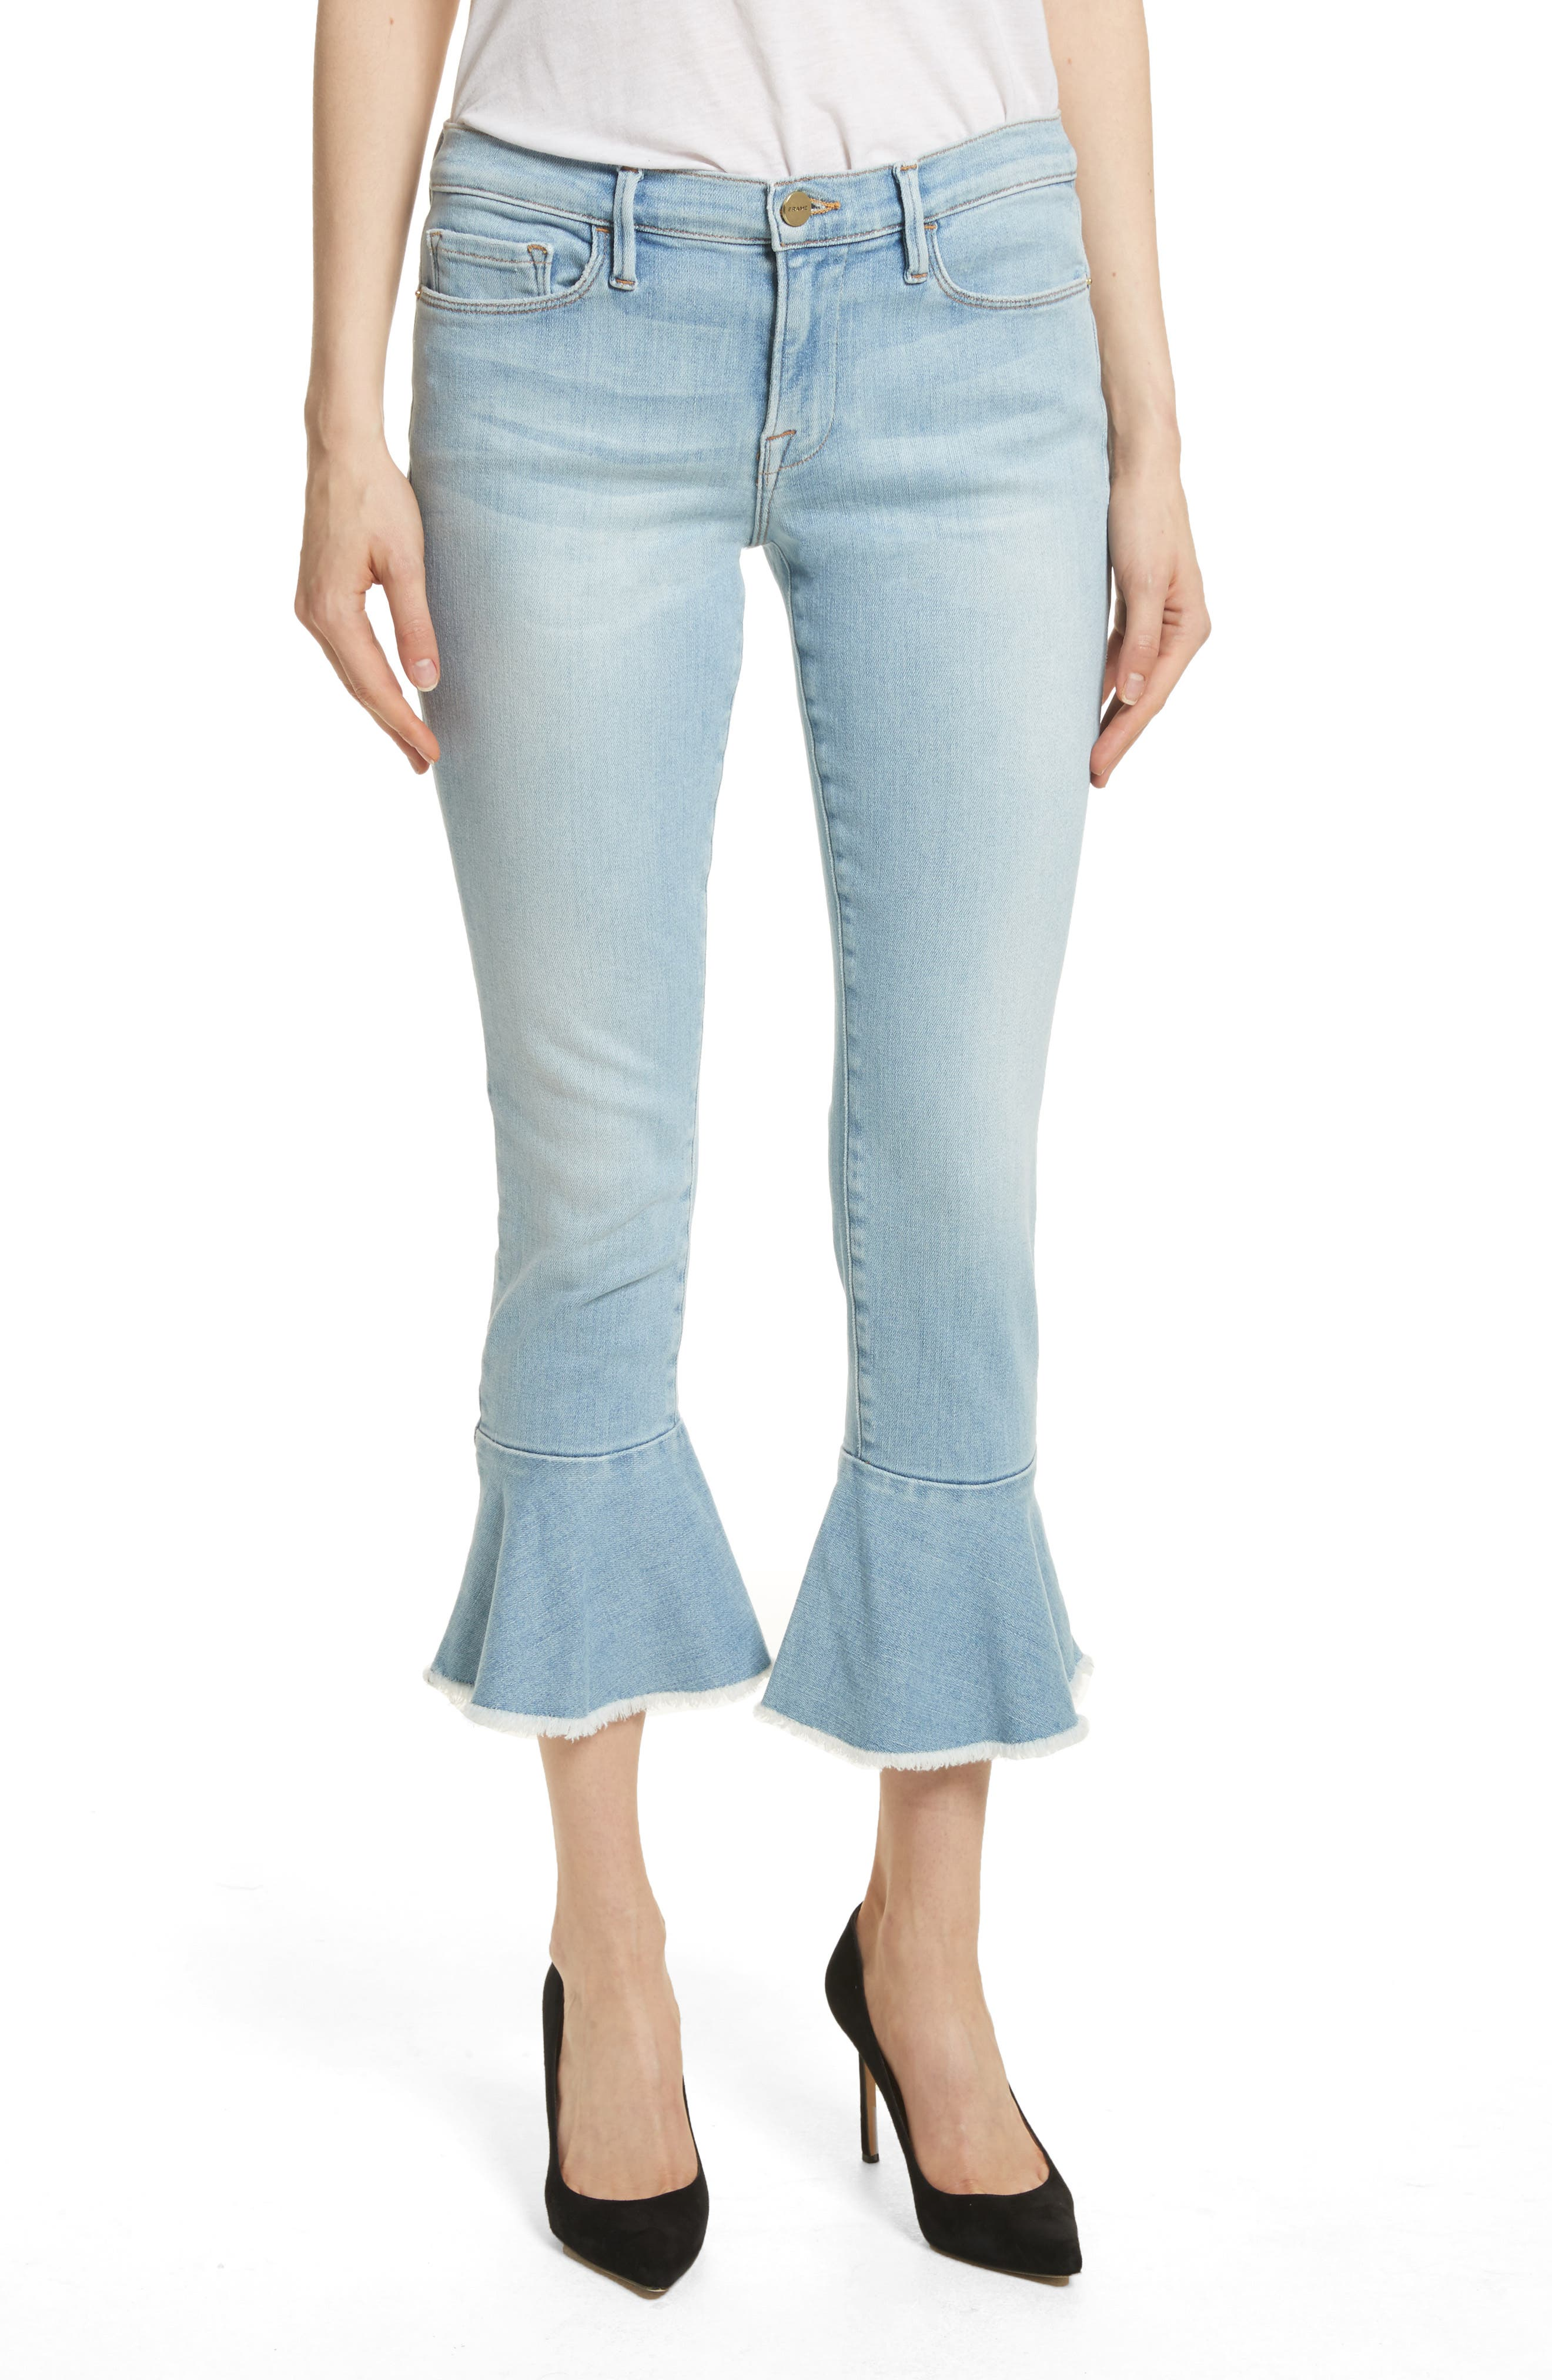 Le Skinny de Jeanne Flounce Skinny Jeans,                             Main thumbnail 1, color,                             Limer Stone